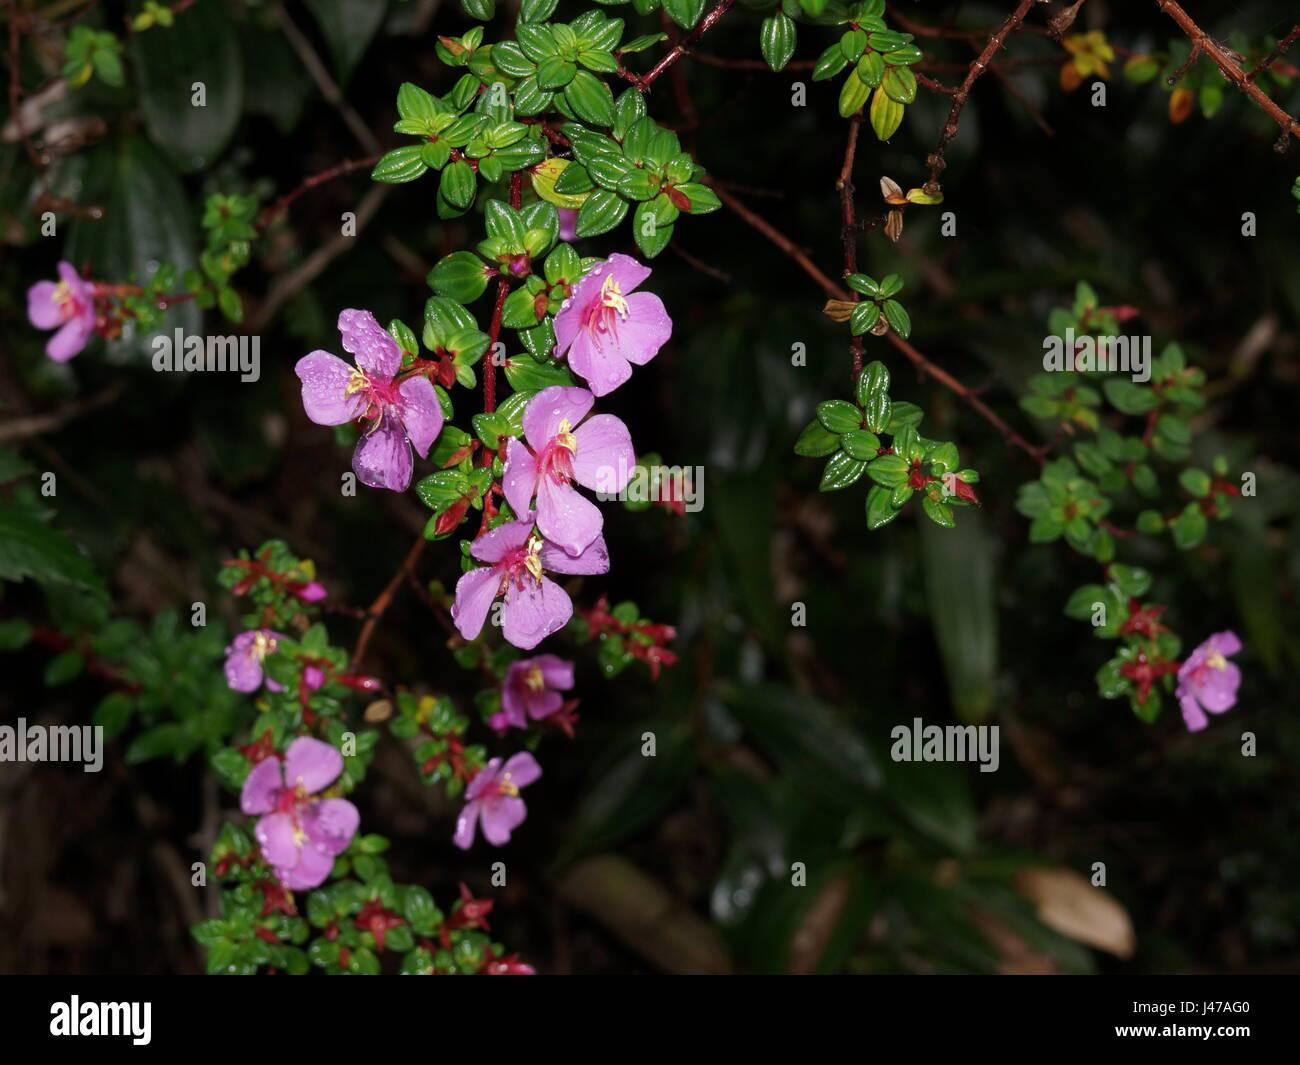 Pink flowers. Monochaetum vulcanicum , Melastomataceae. Costa Rica, Alajuela Province, Poas - Stock Image